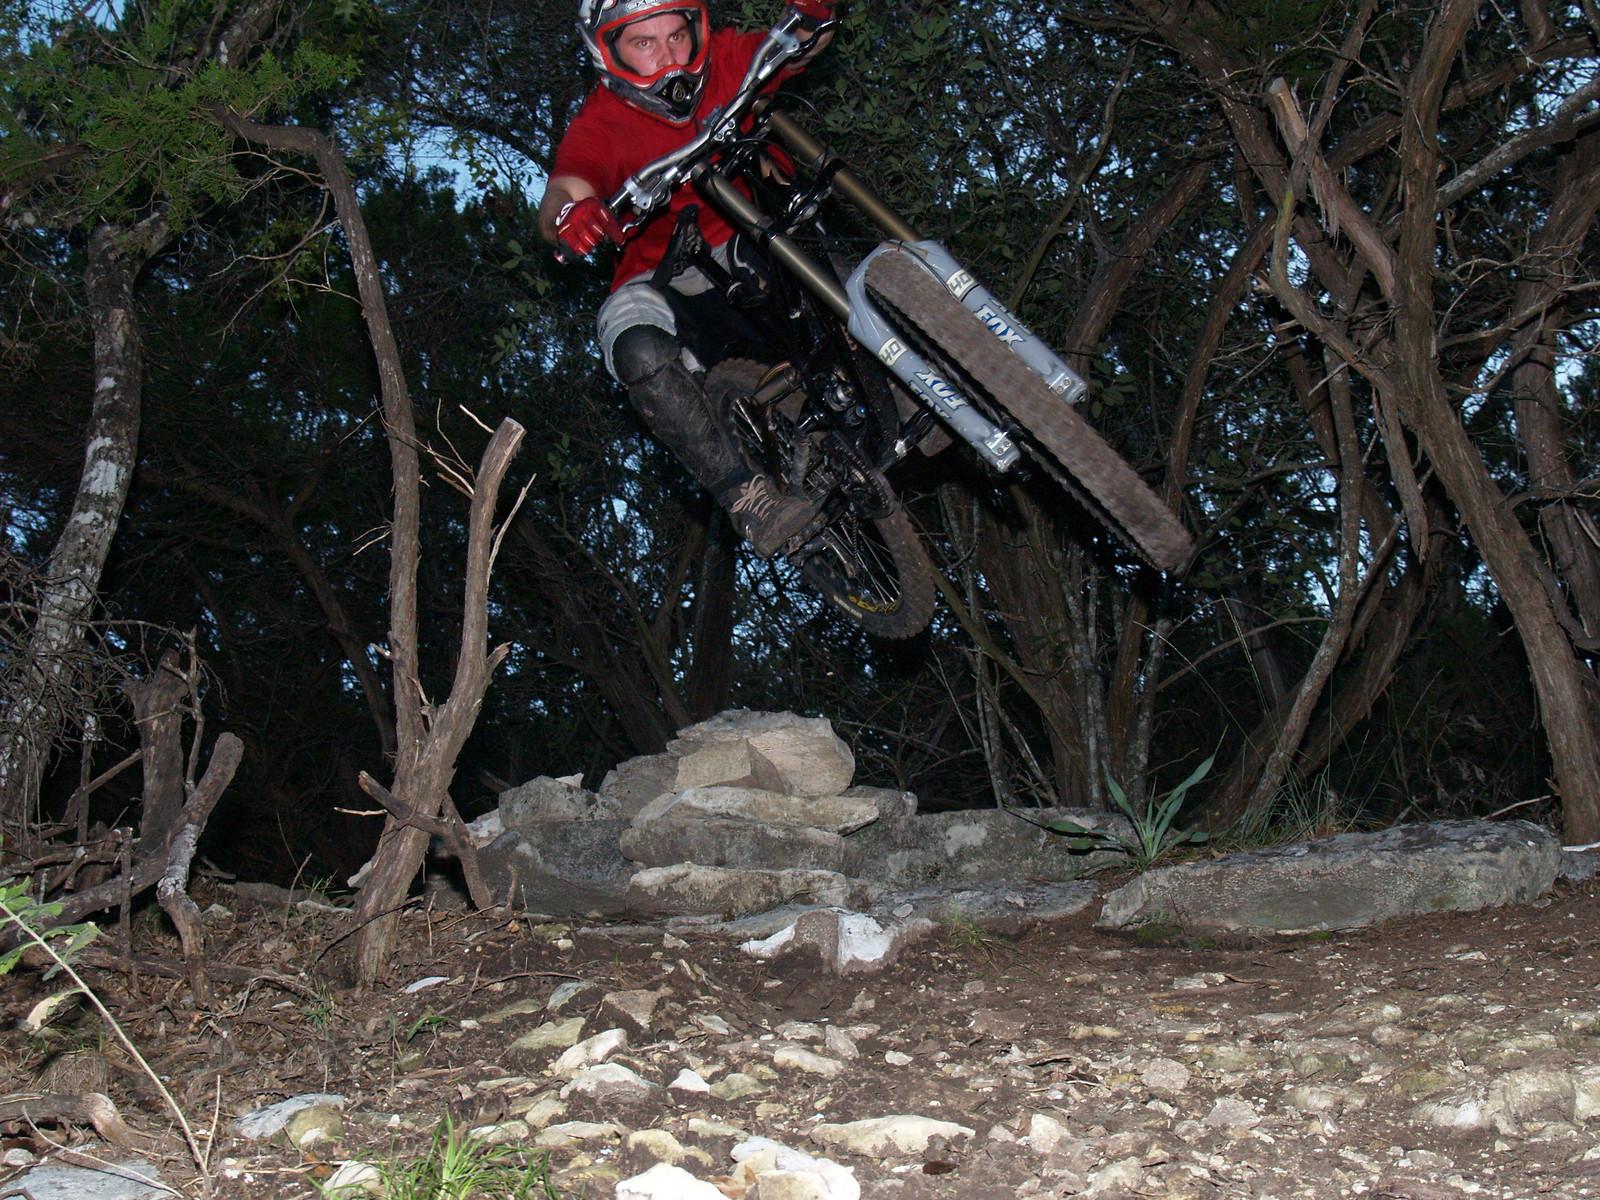 P9272624 - Pwest - Mountain Biking Pictures - Vital MTB